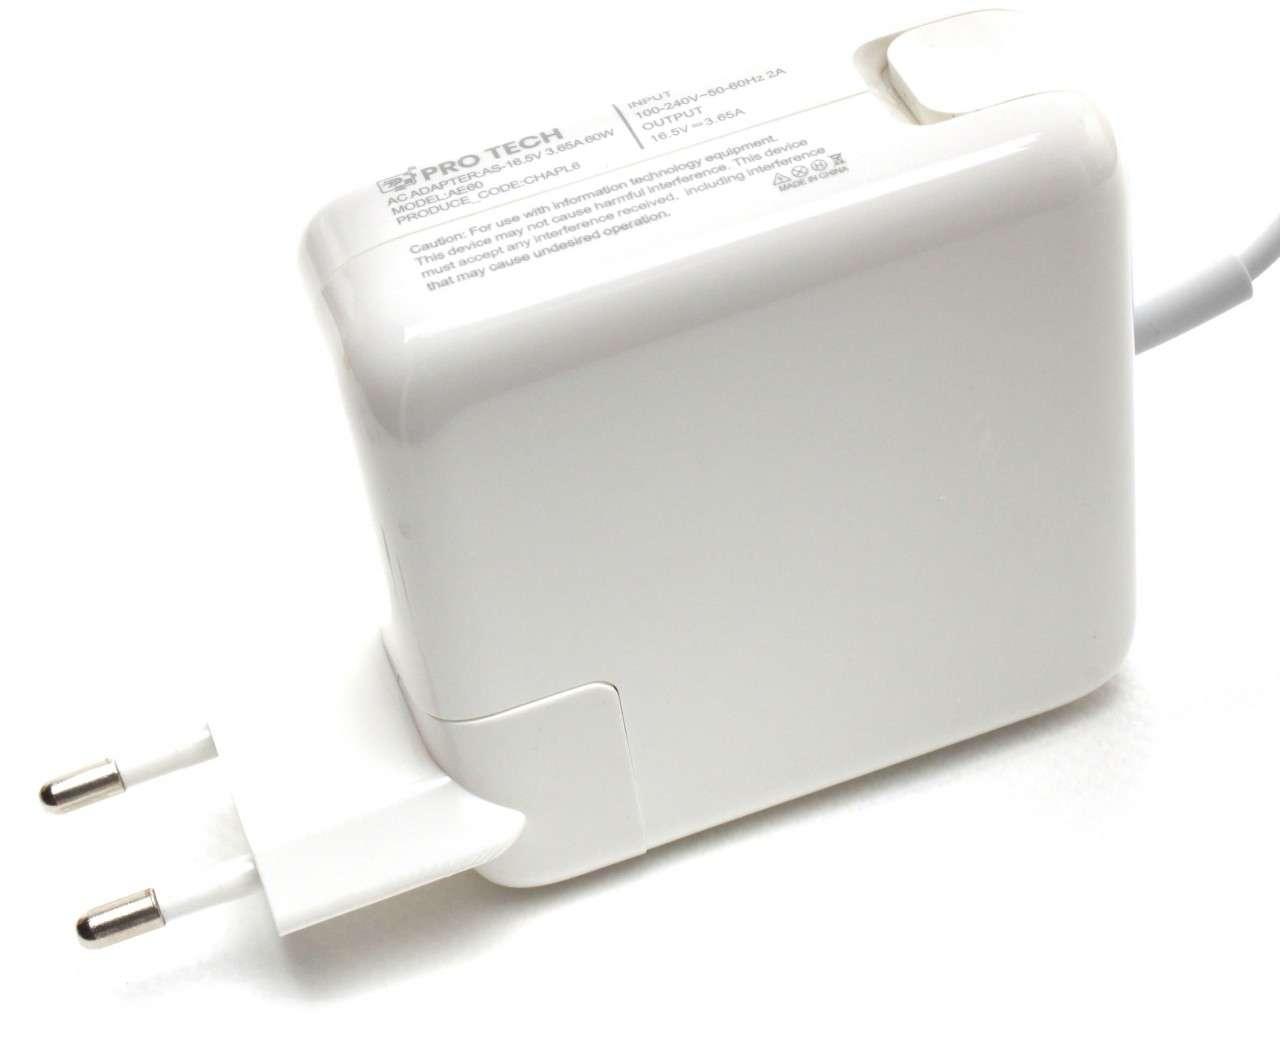 Incarcator Apple MacBook A1330 Replacement imagine powerlaptop.ro 2021